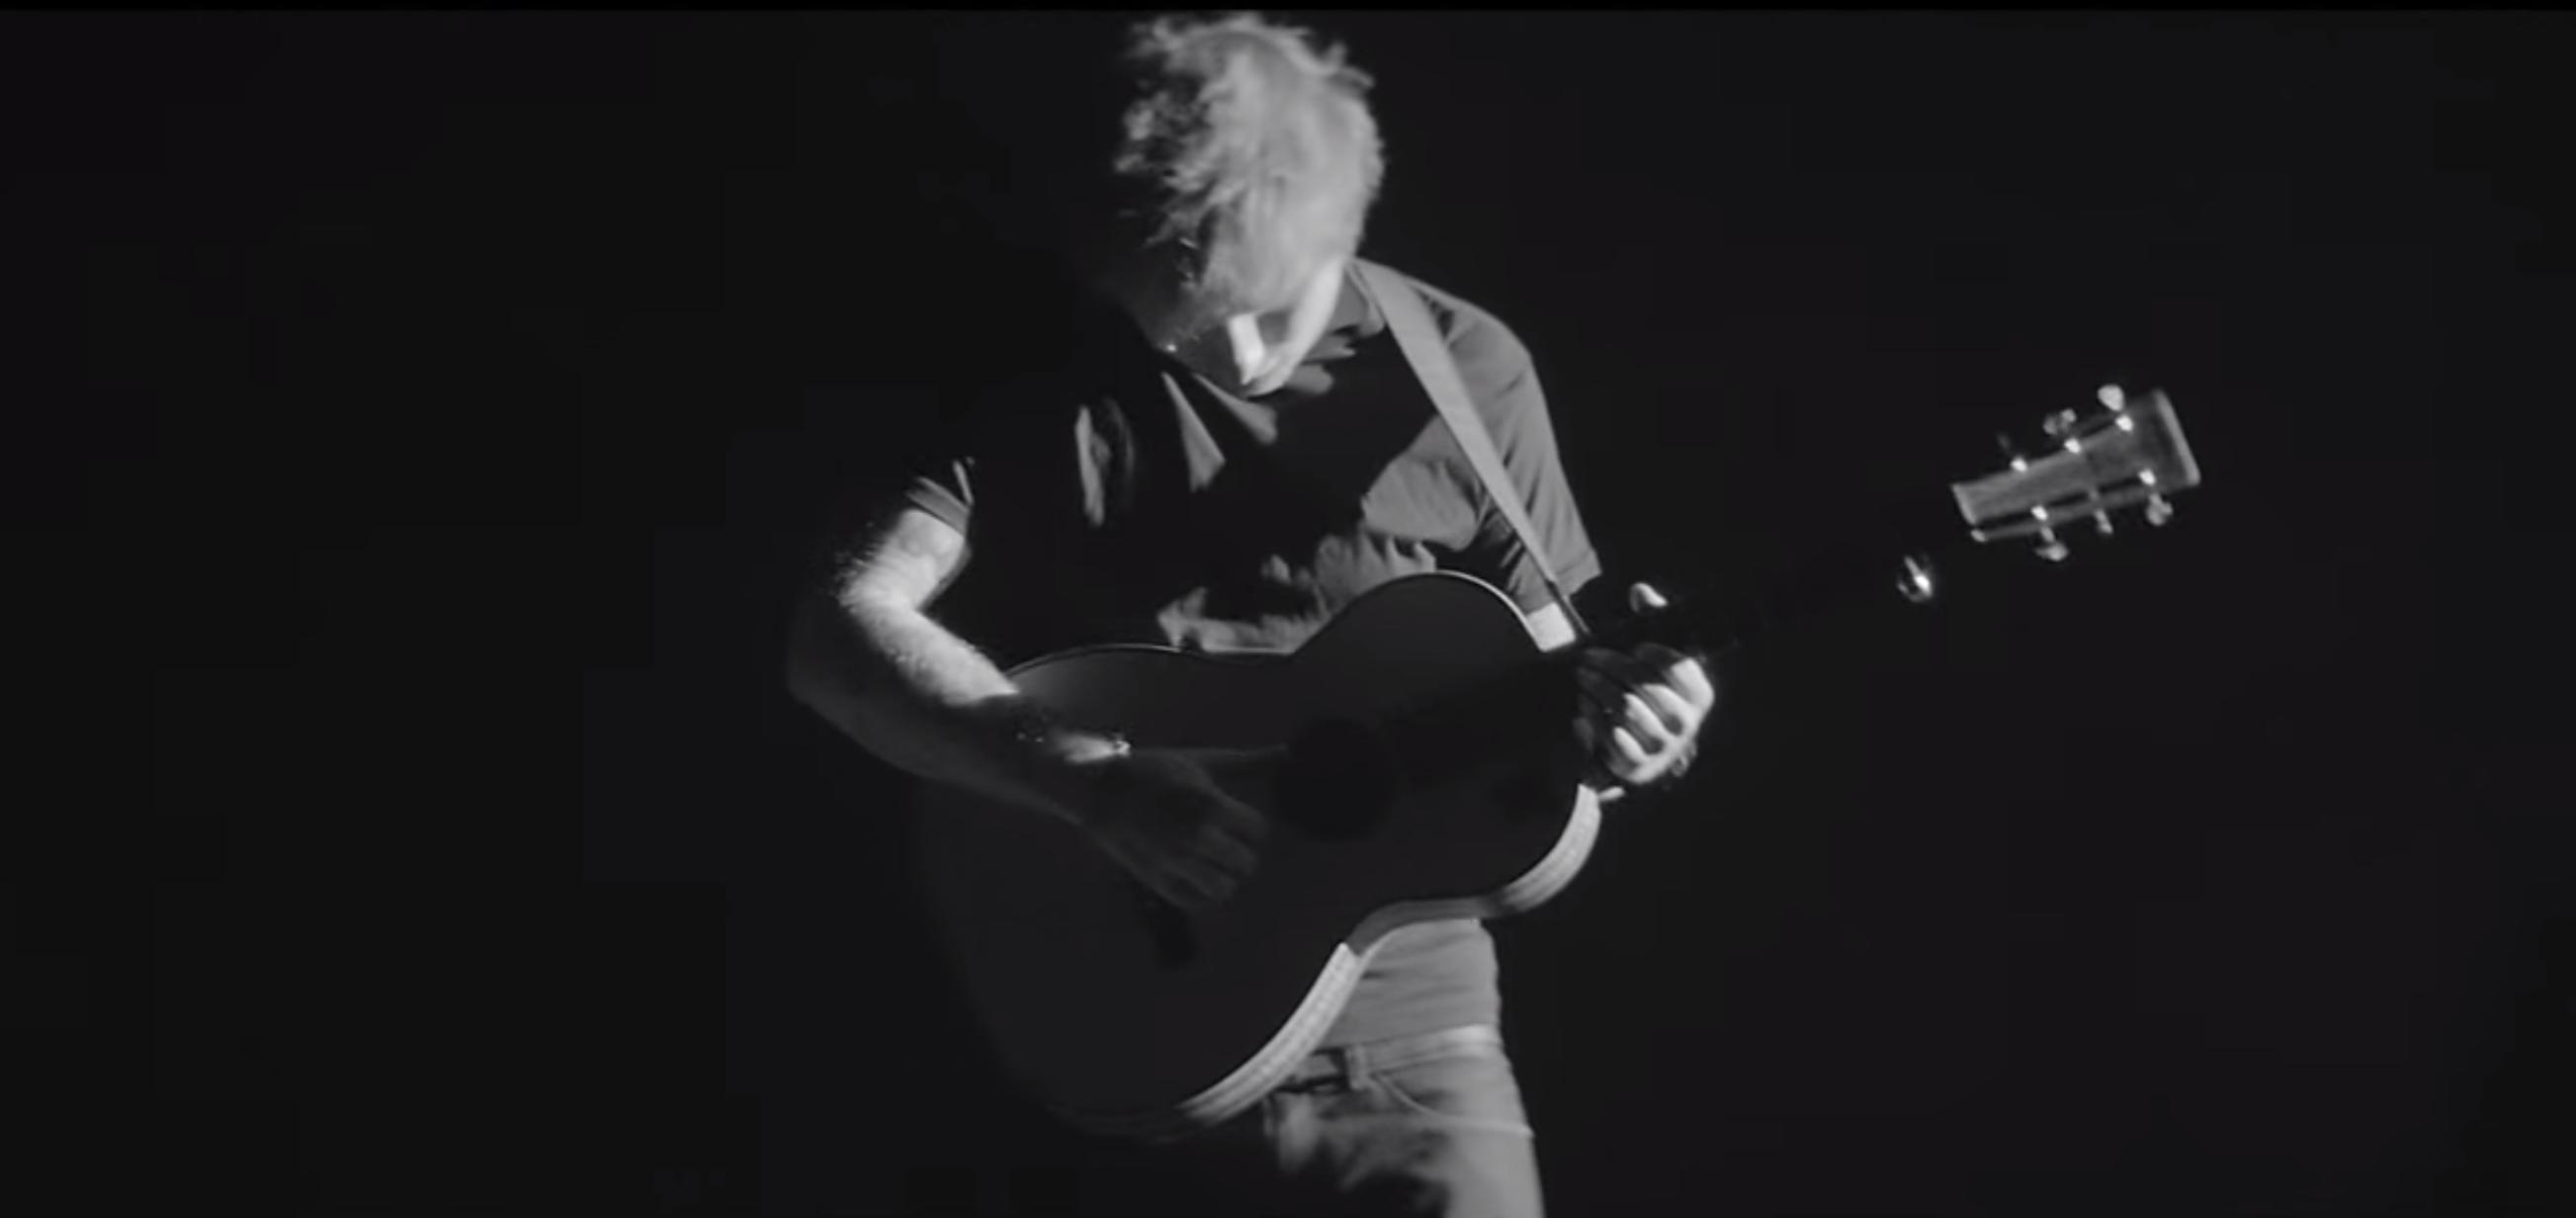 ed sheeran black and white on Tumblr